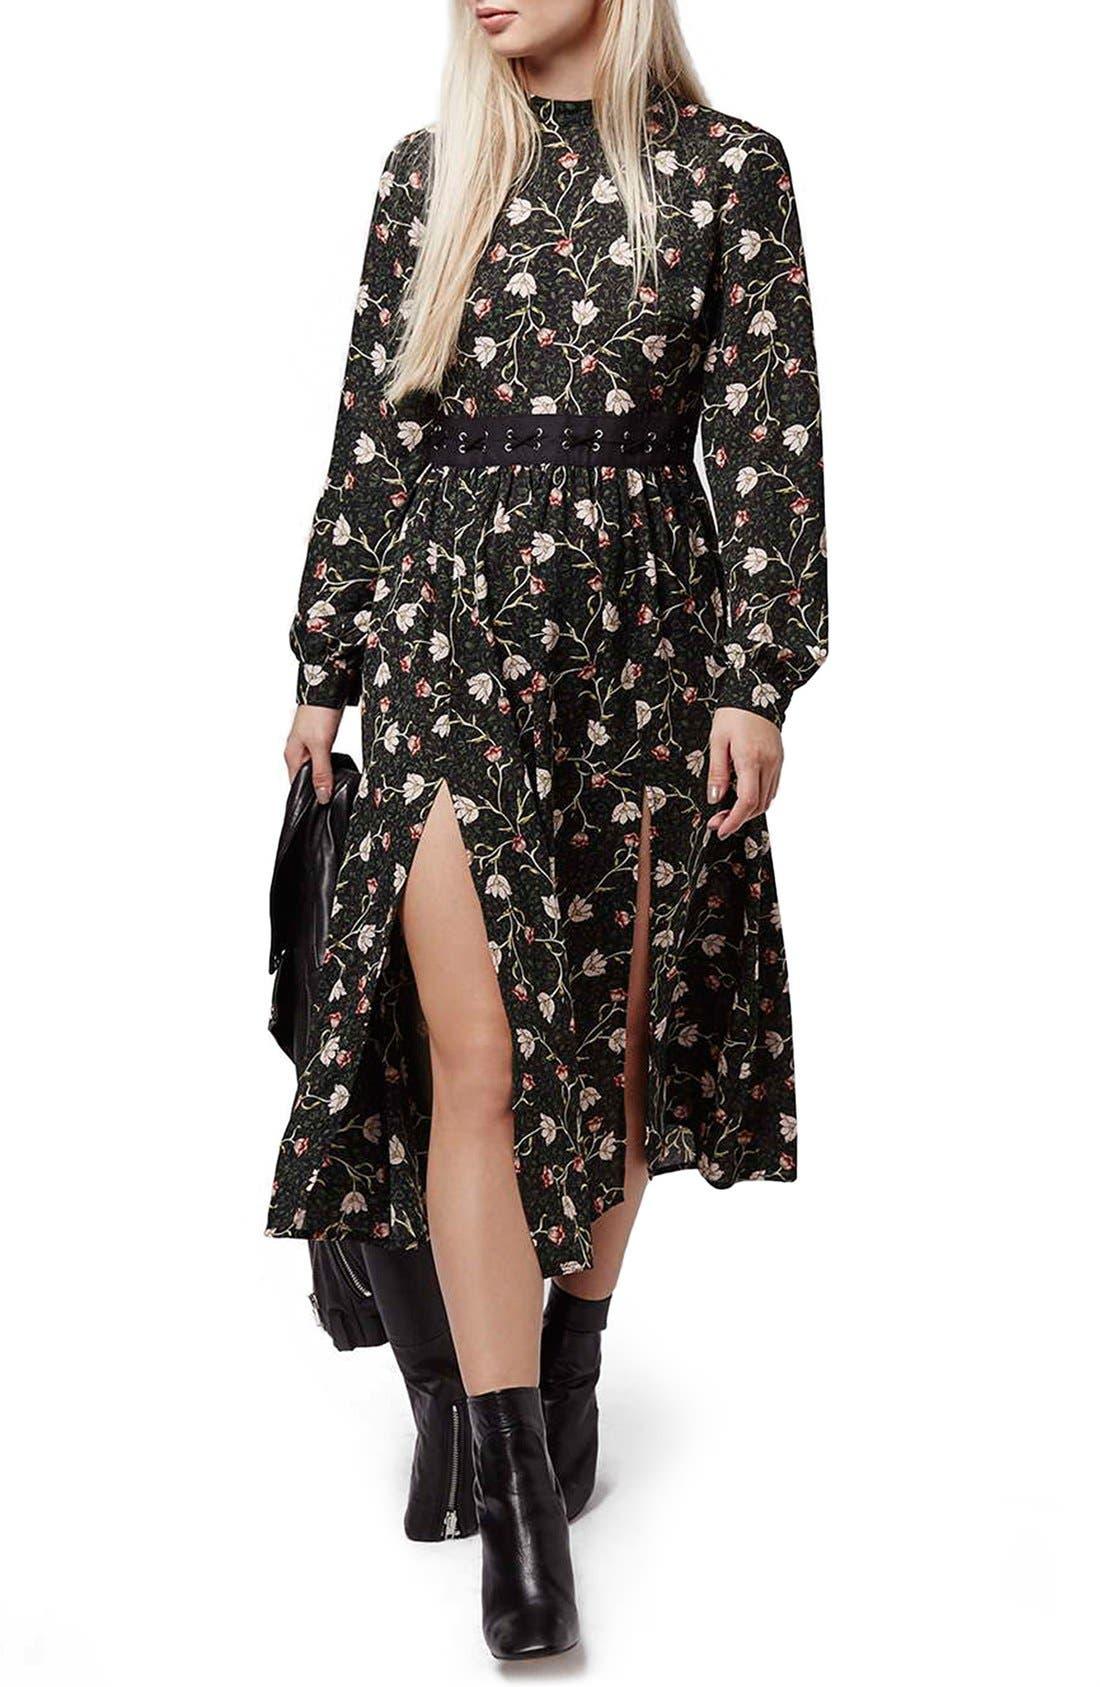 TOPSHOP, Tulip Print Midi Dress, Main thumbnail 1, color, 301